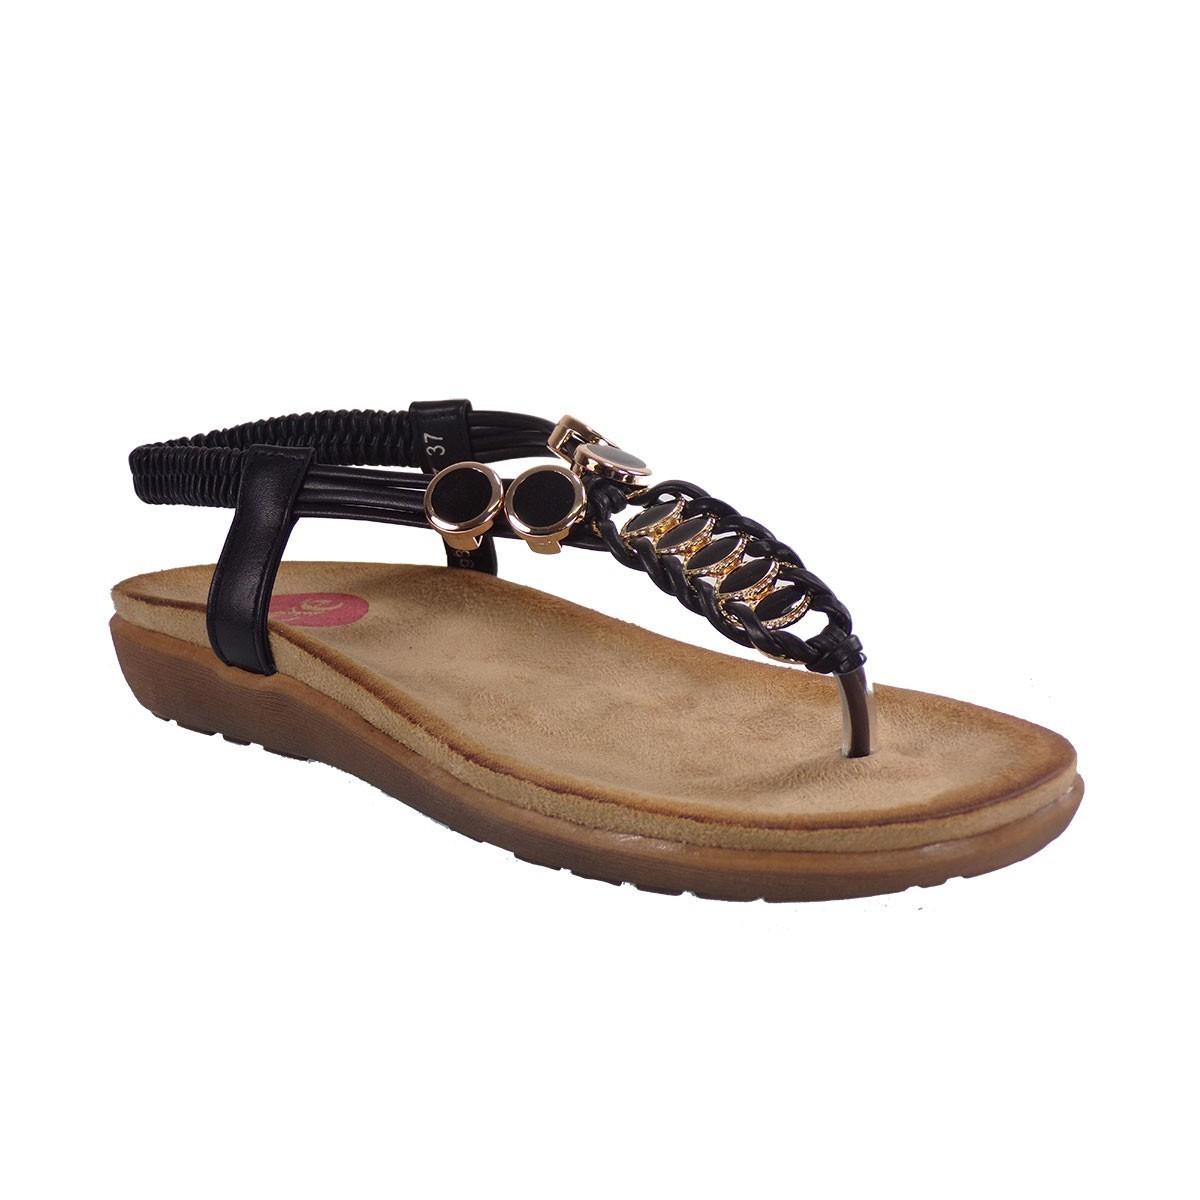 EXE Shoes Γυναικεία Πέδιλα 817 Μαύρο G4900817177505  b07ad4ba707